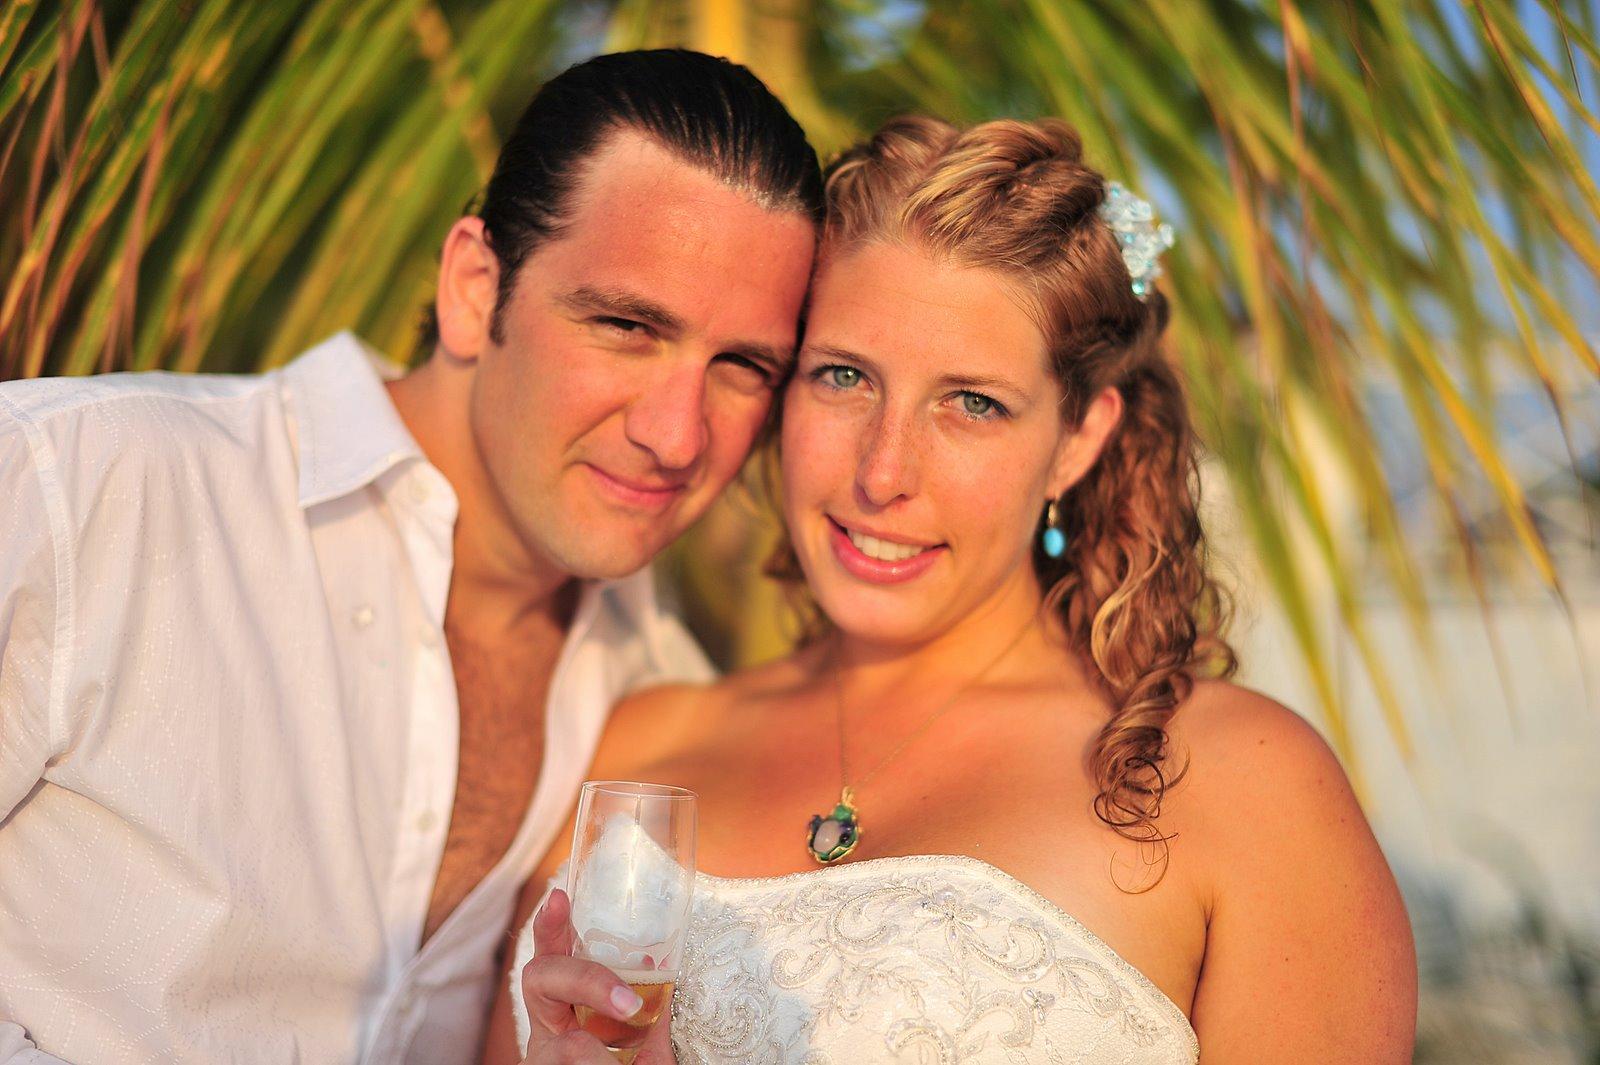 Eloping in the Caribbean – Jamaica Destination Beach Wedding – Sneak Peek, Miami Wedding Photographers | Häring Photography, Indian Wedding Photographer in Florida, Best Muslim, Hindu - South East Asian Wedding Photographers